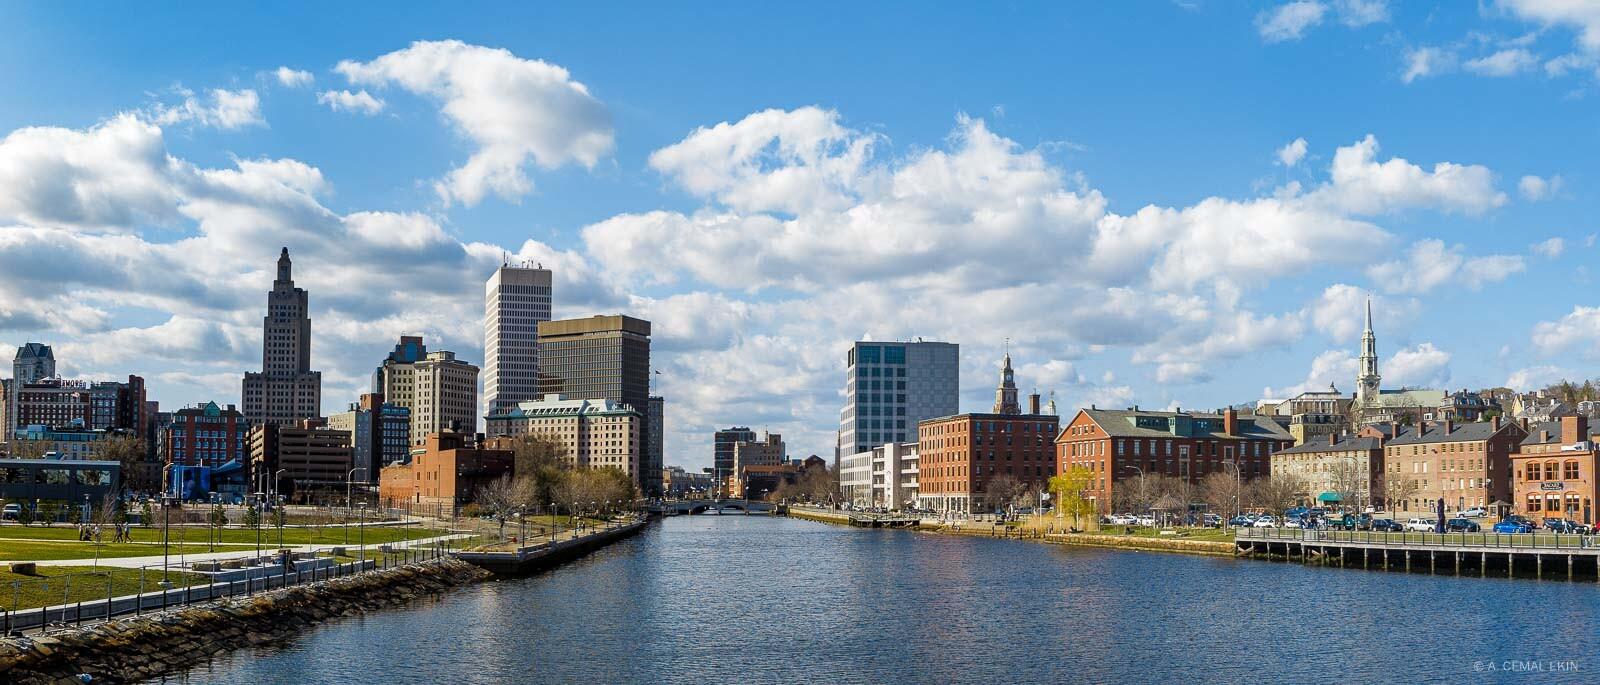 Providence skyline over the river